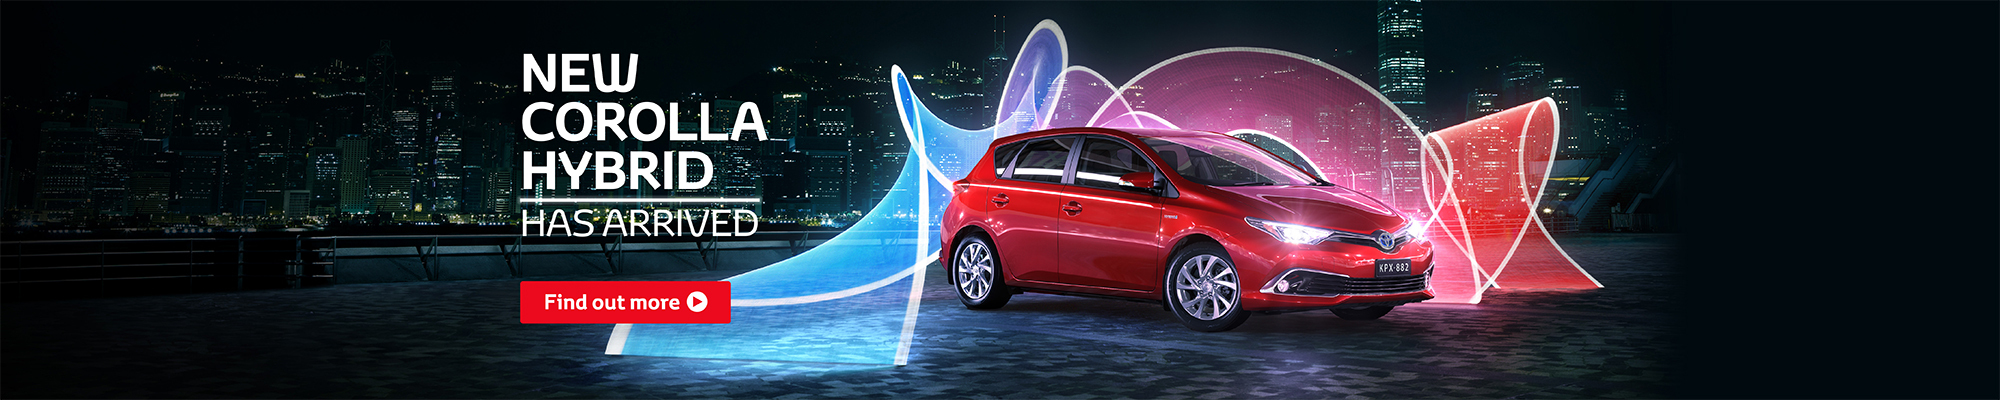 New Corolla Hybrid Melbourne